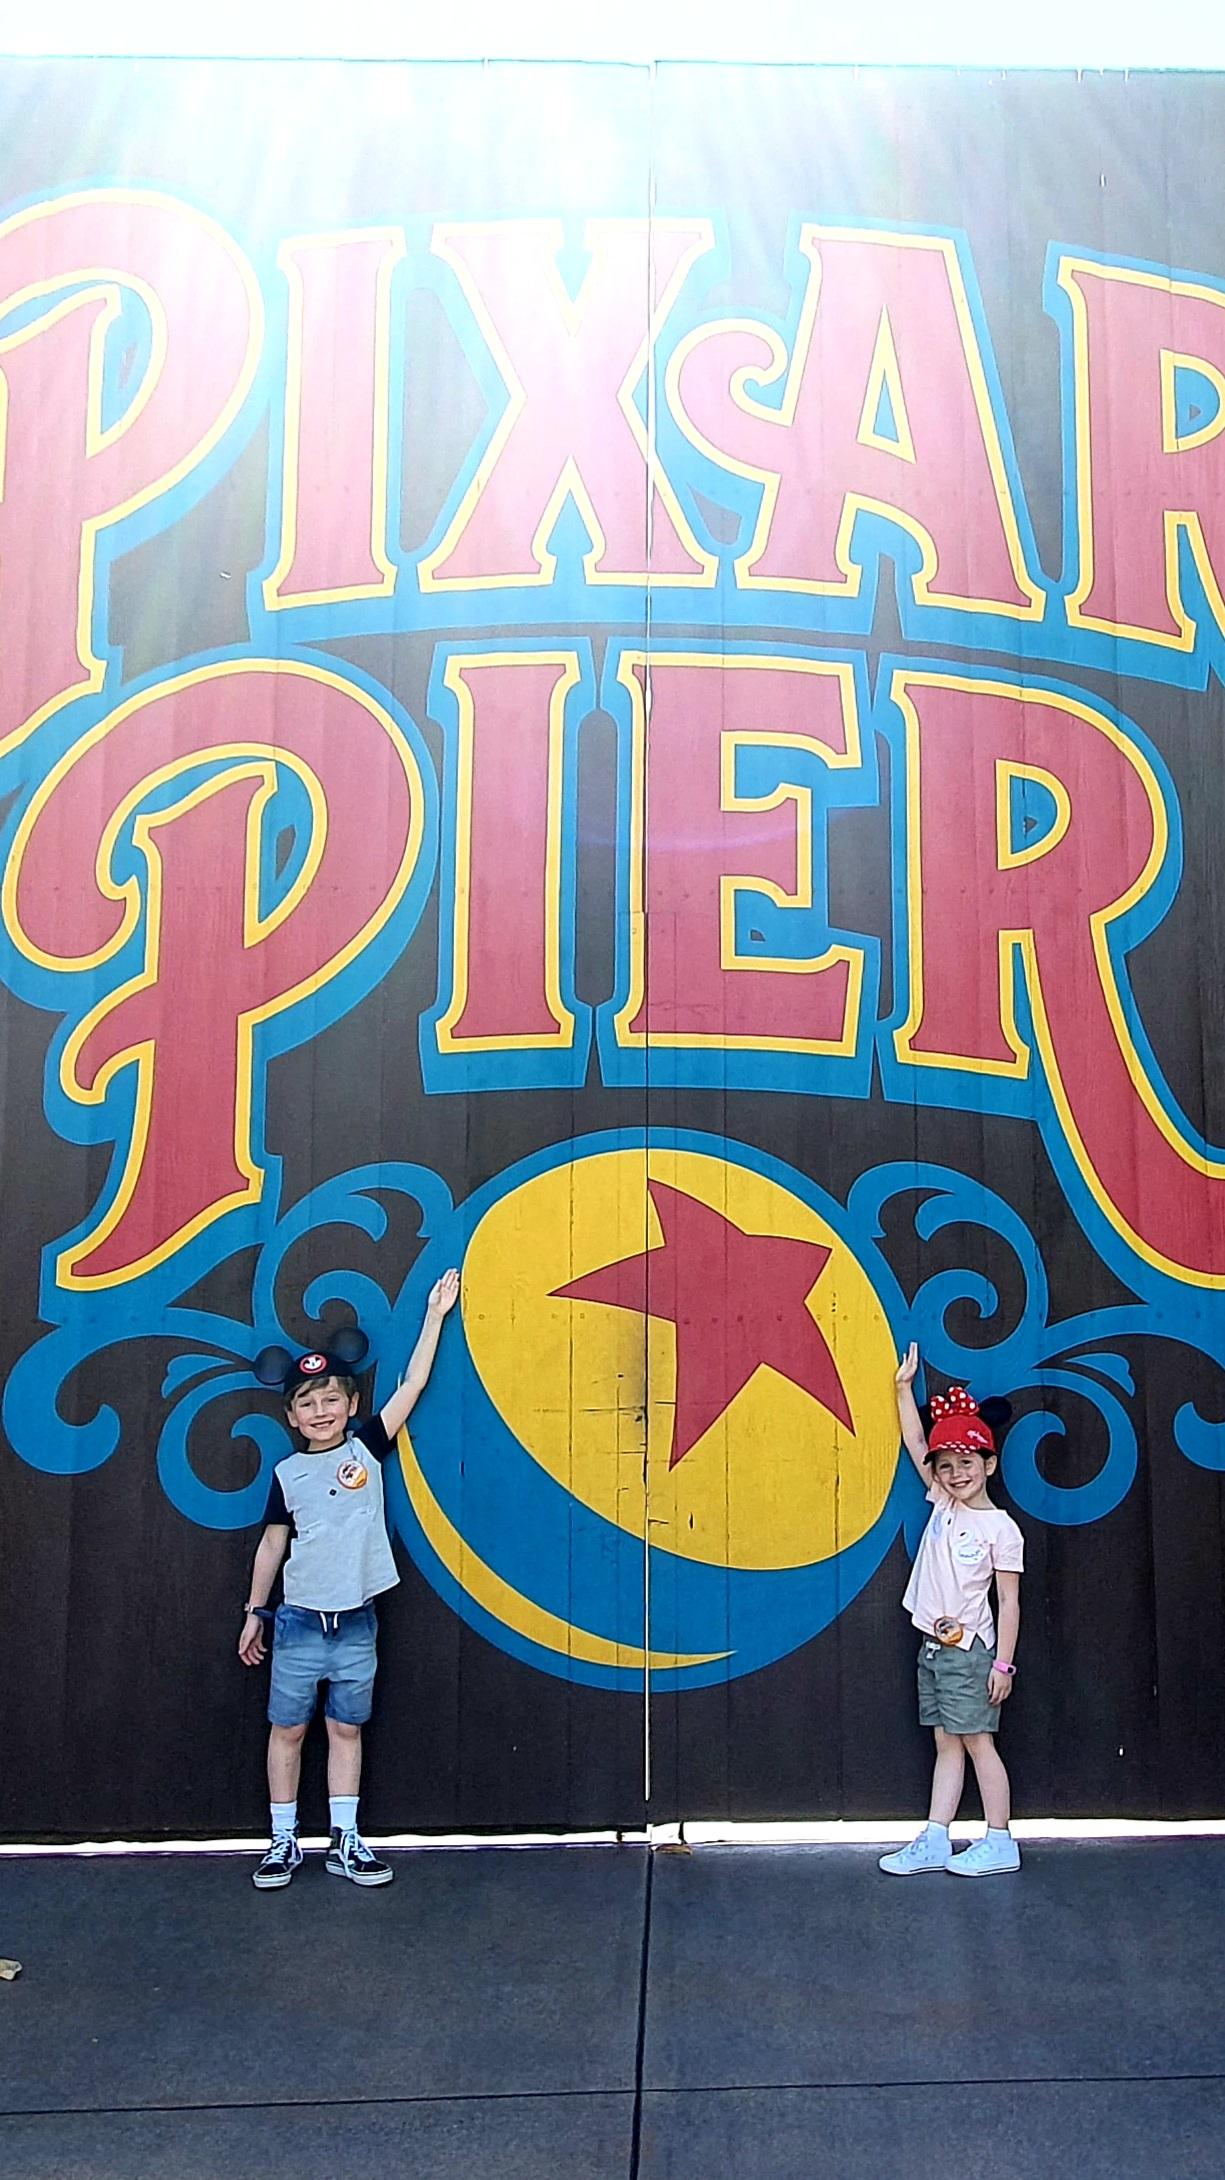 California Adventure Photo Spots - Pixar Pier